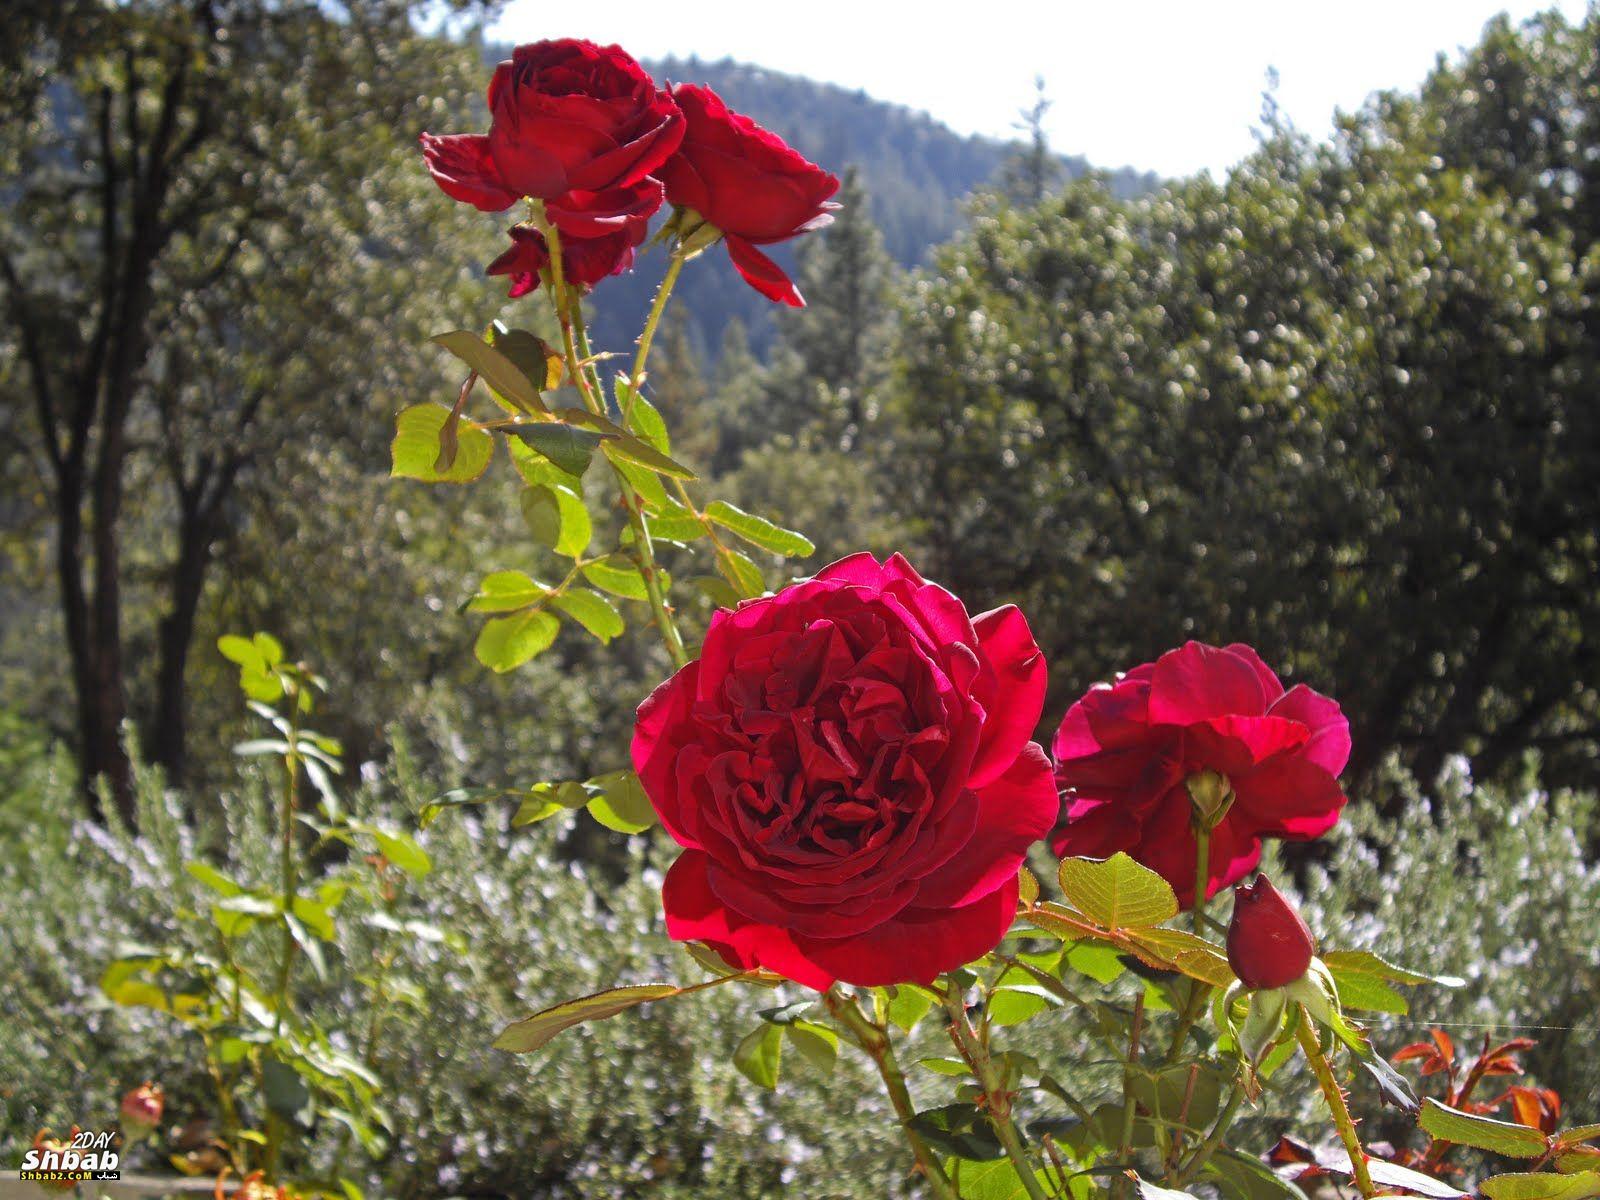 بالصور صور اجمل ورد , اجمل صور لبوكيهات الورد 3493 4